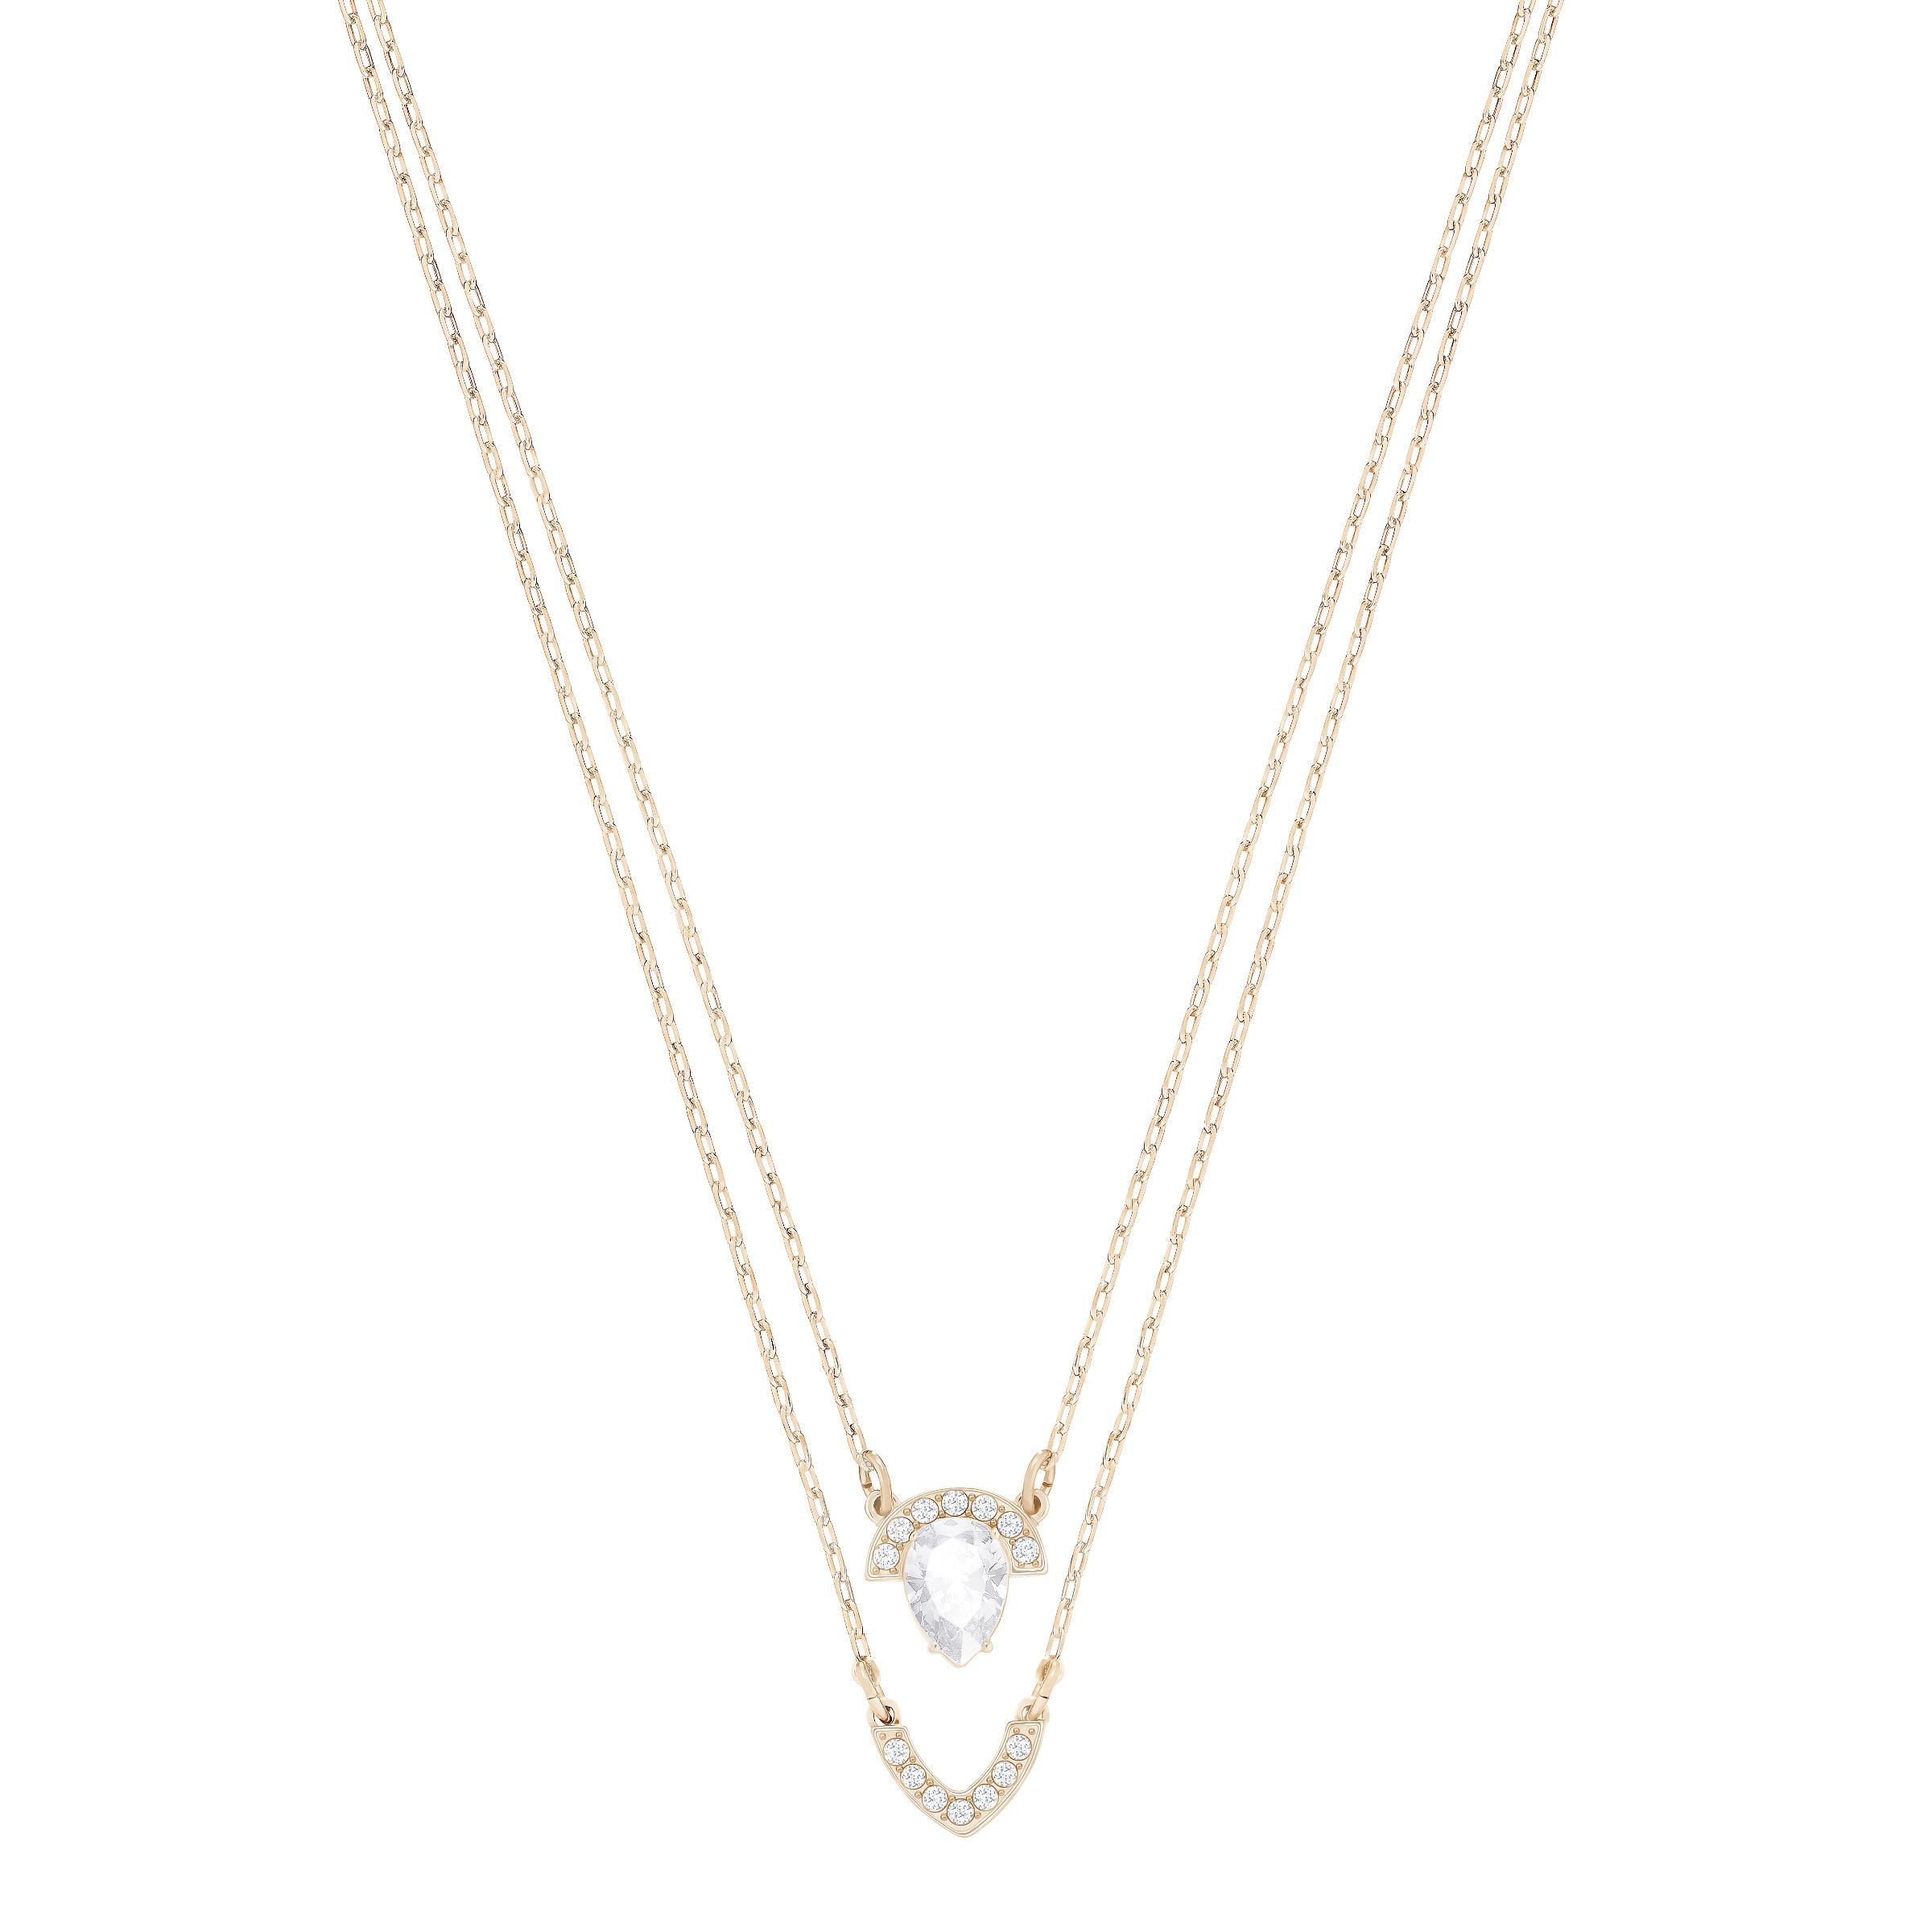 Collier Swarovski multi rangs Gallery Pear, blanc, plaqué or rose